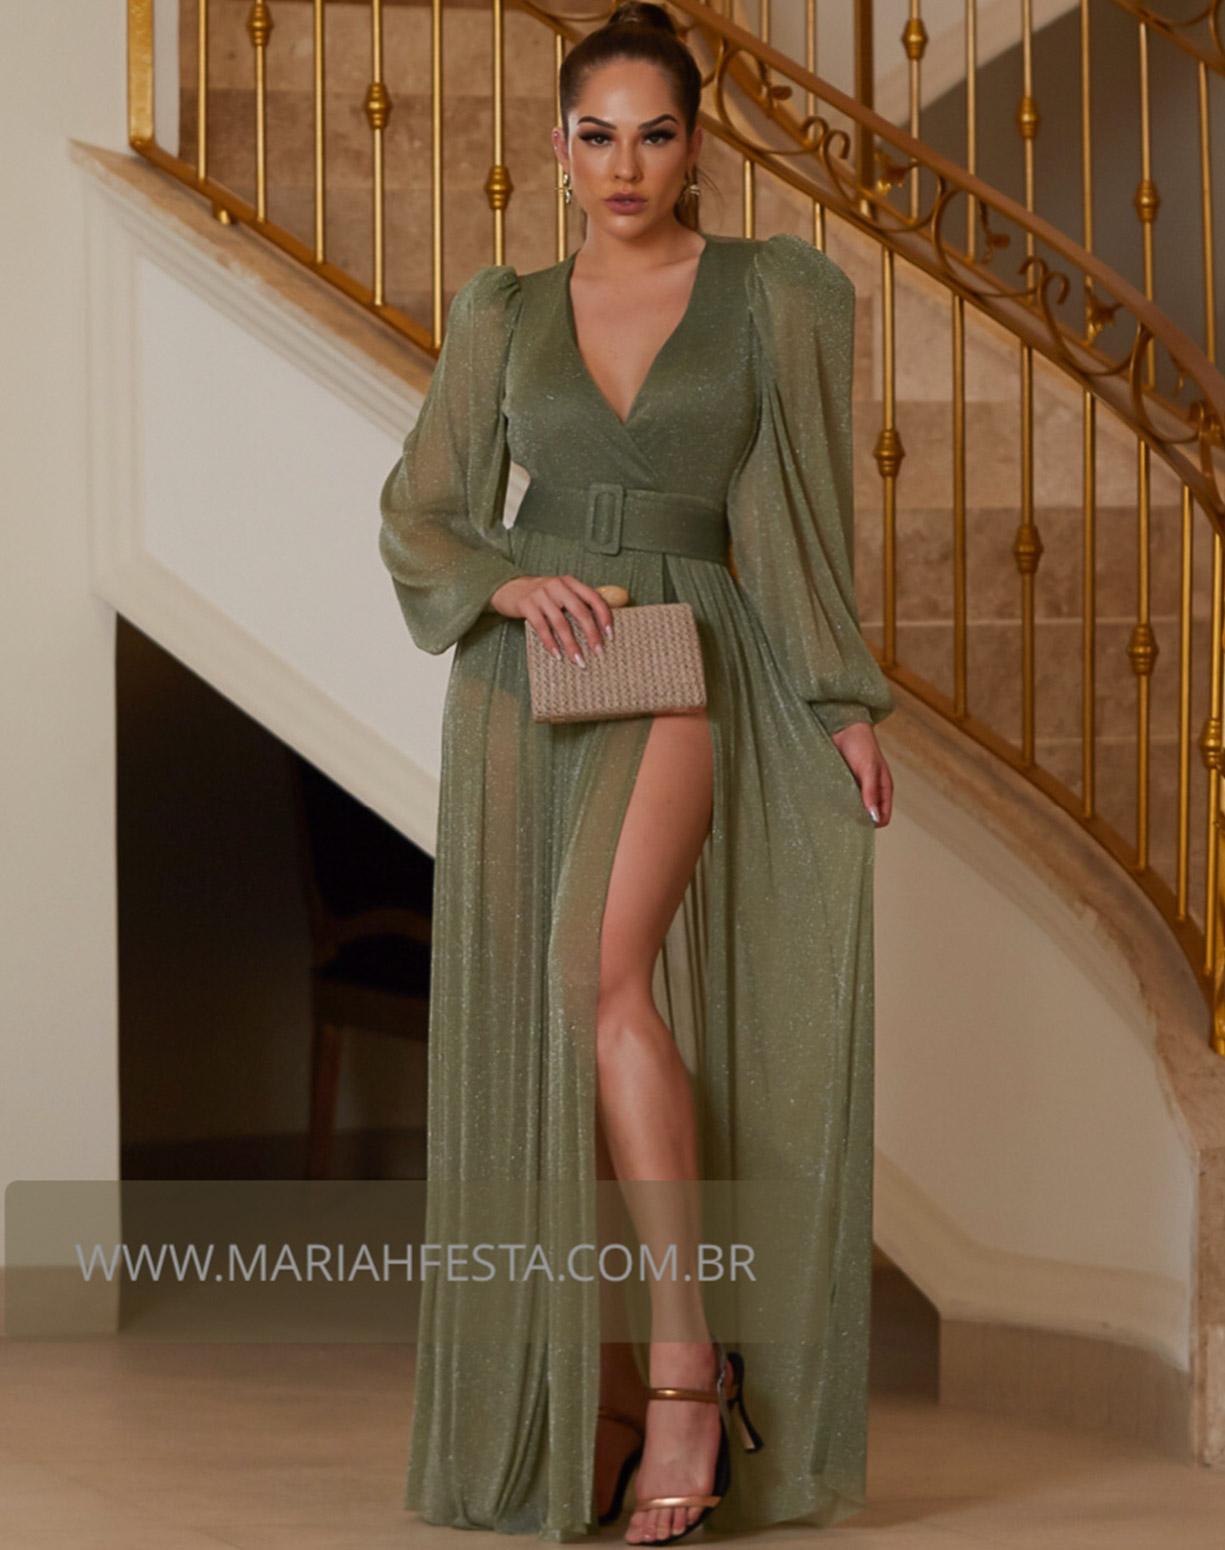 Vestido Verde Oliva em Tule de Lúrex com Manga Longa